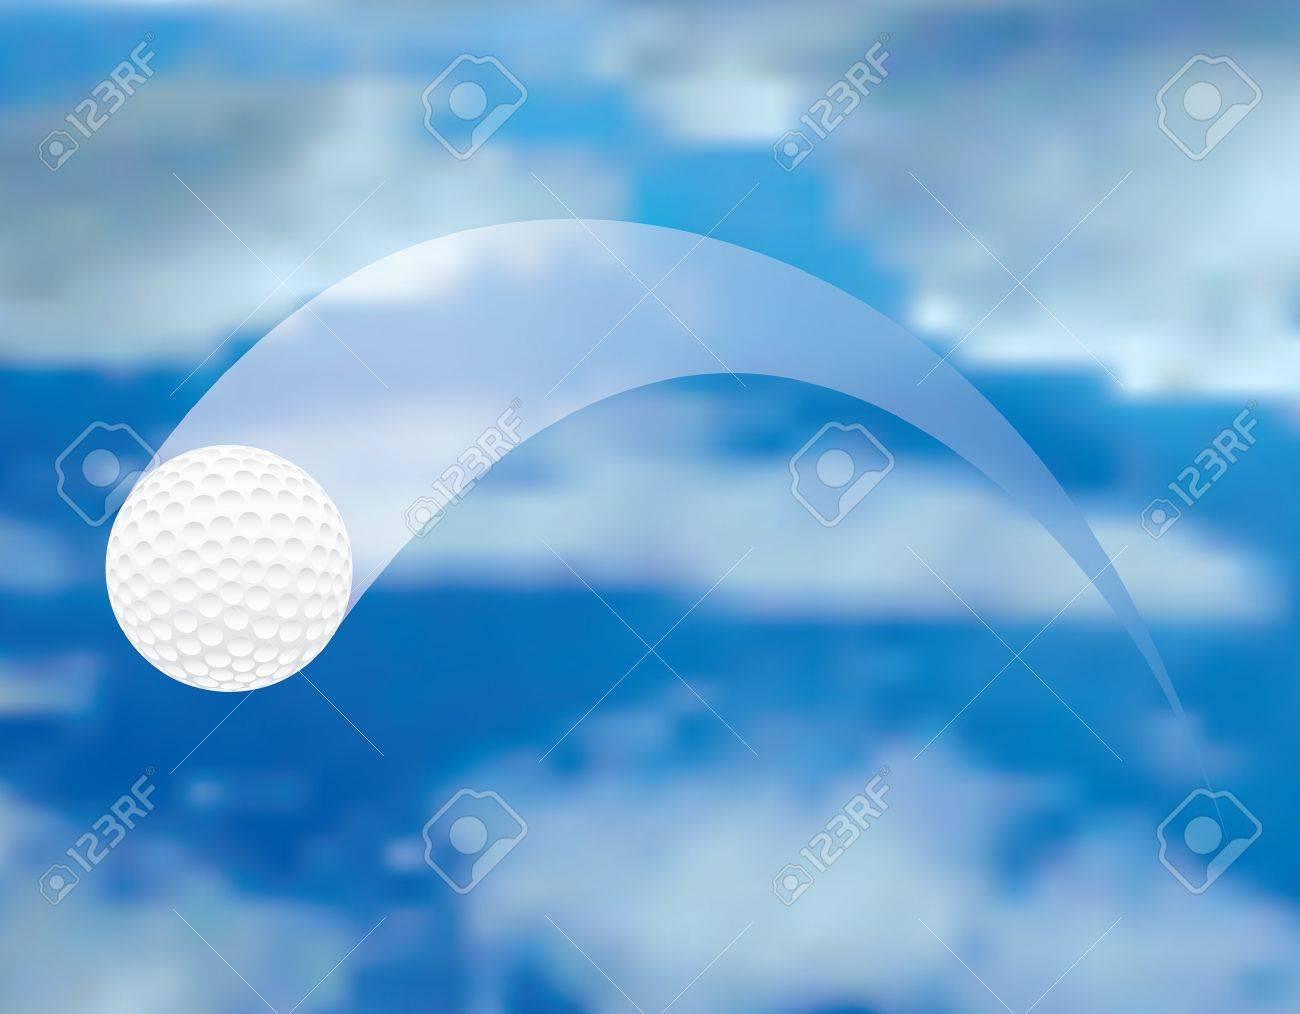 vector illustration of the flying golf ball Stock Vector - 10762891